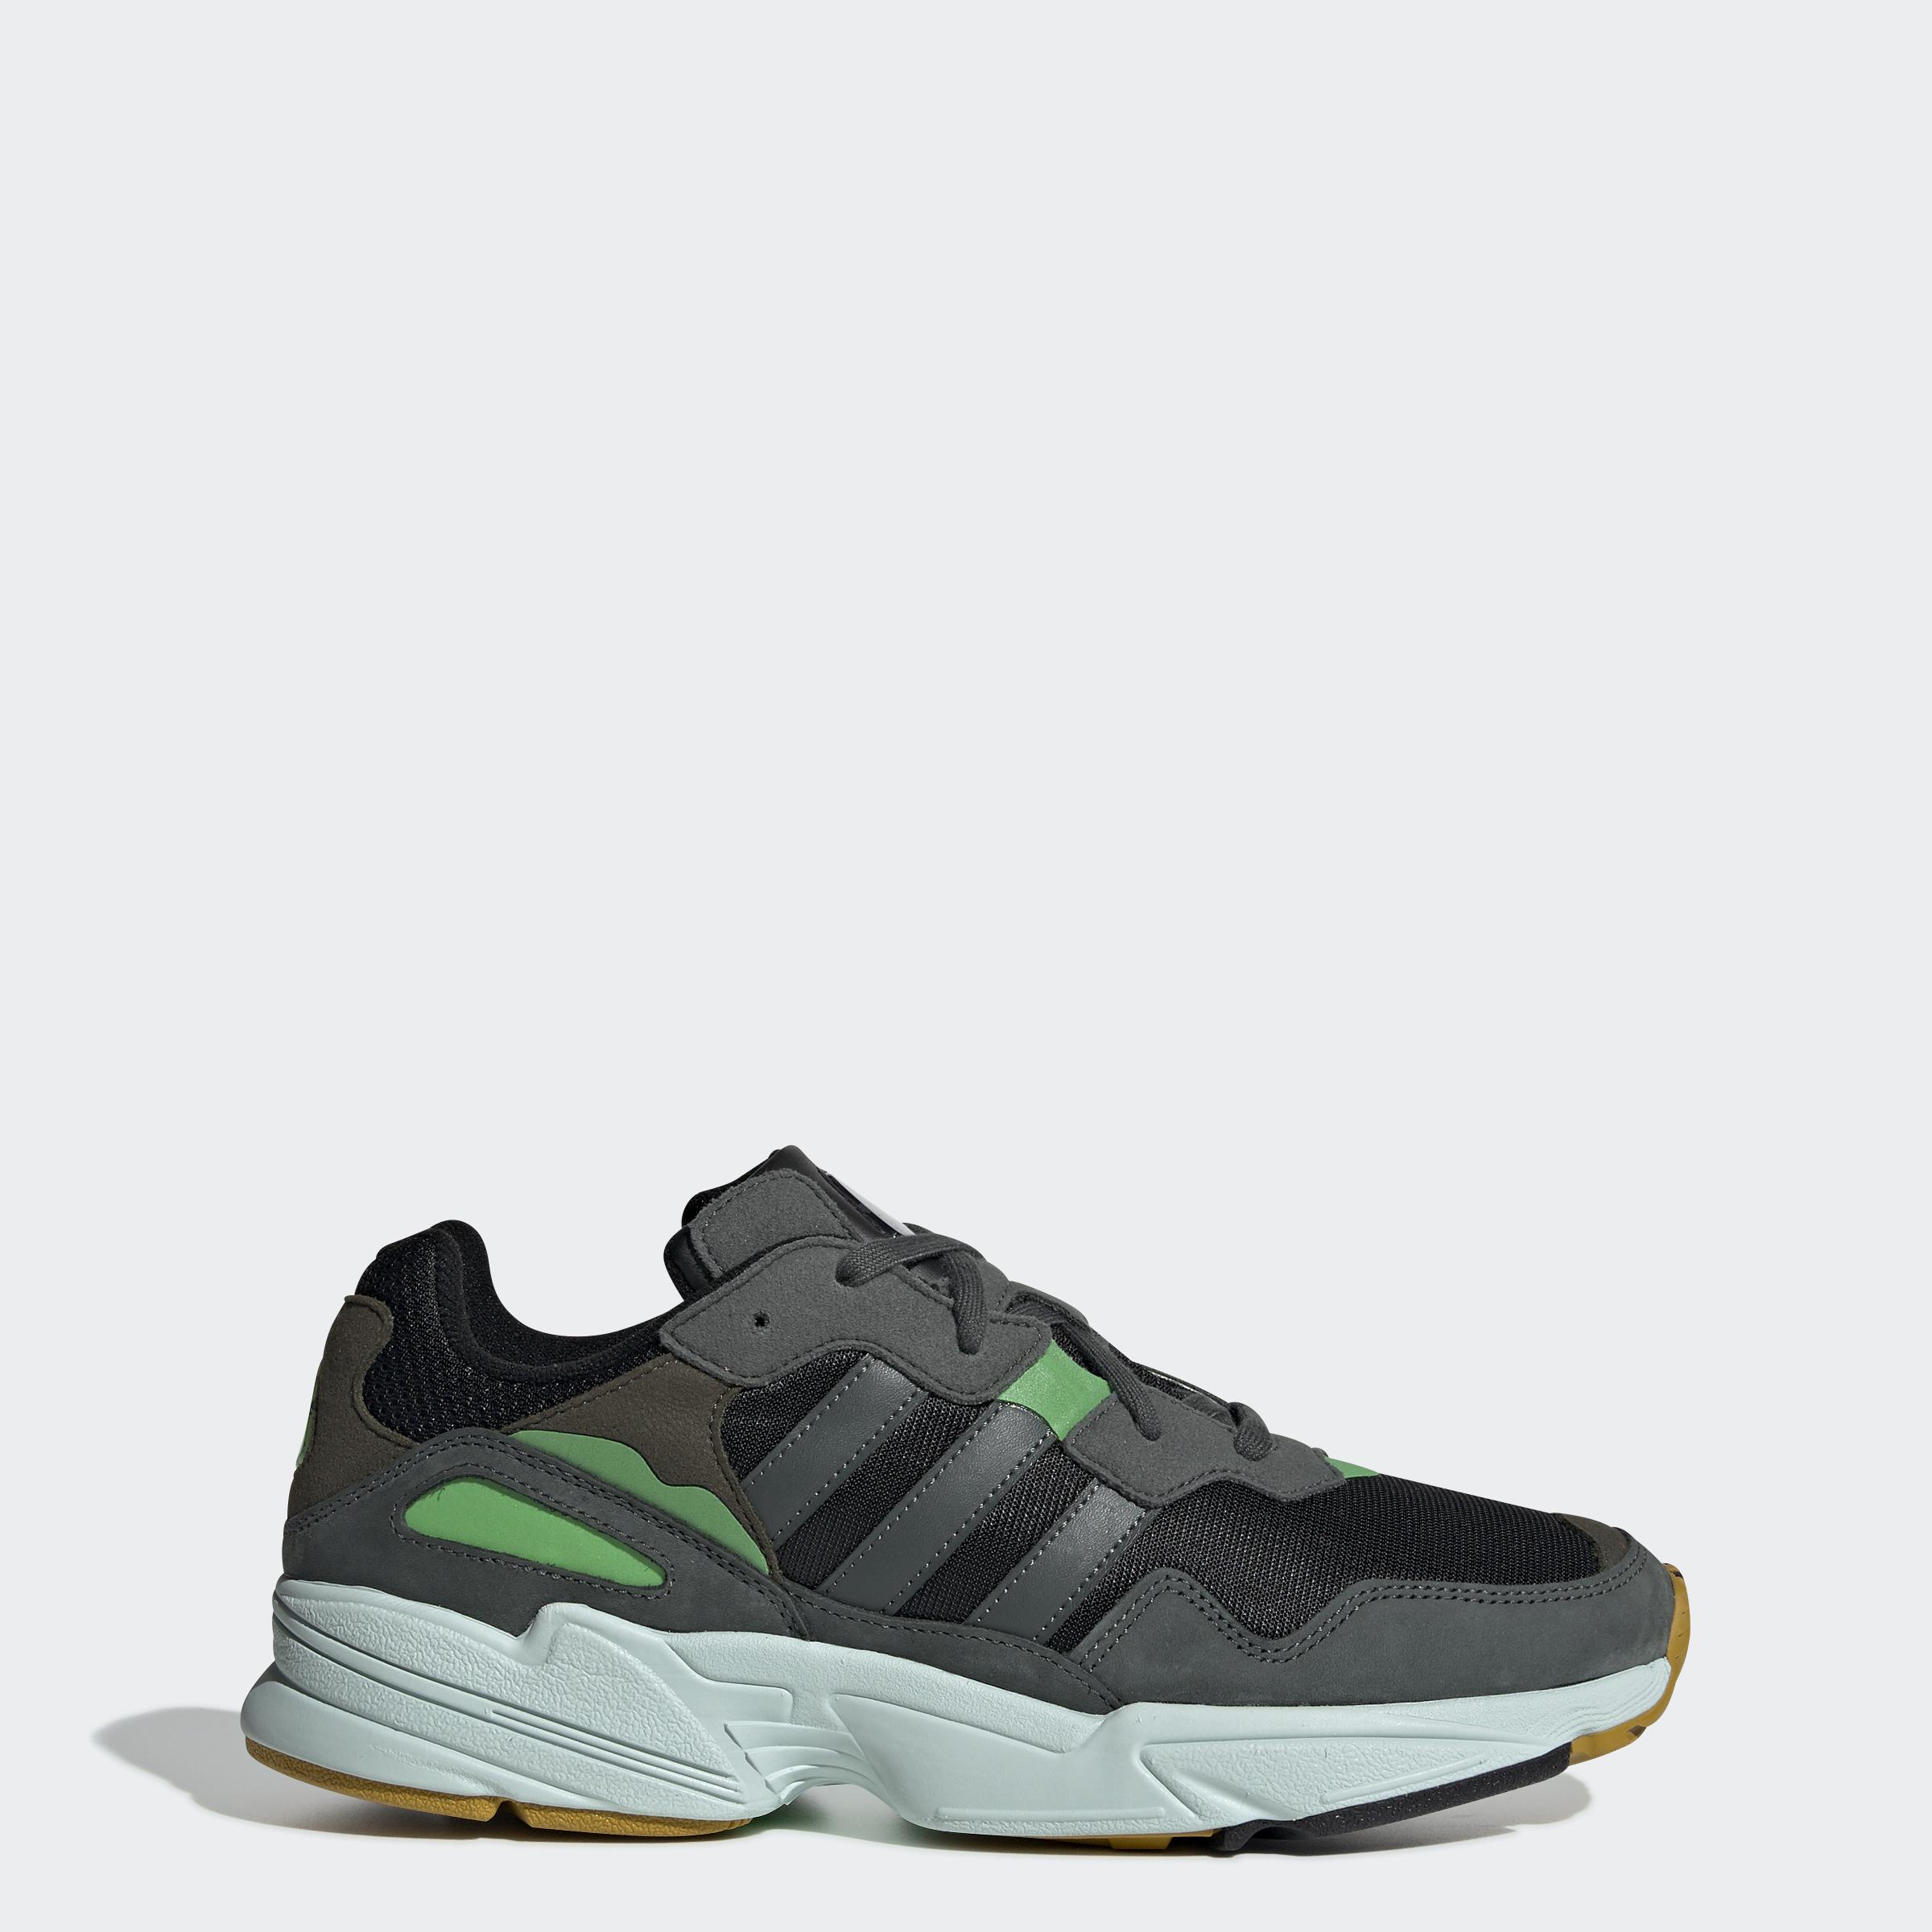 adidas-Originals-Yung-96-Shoes-Men-039-s thumbnail 10